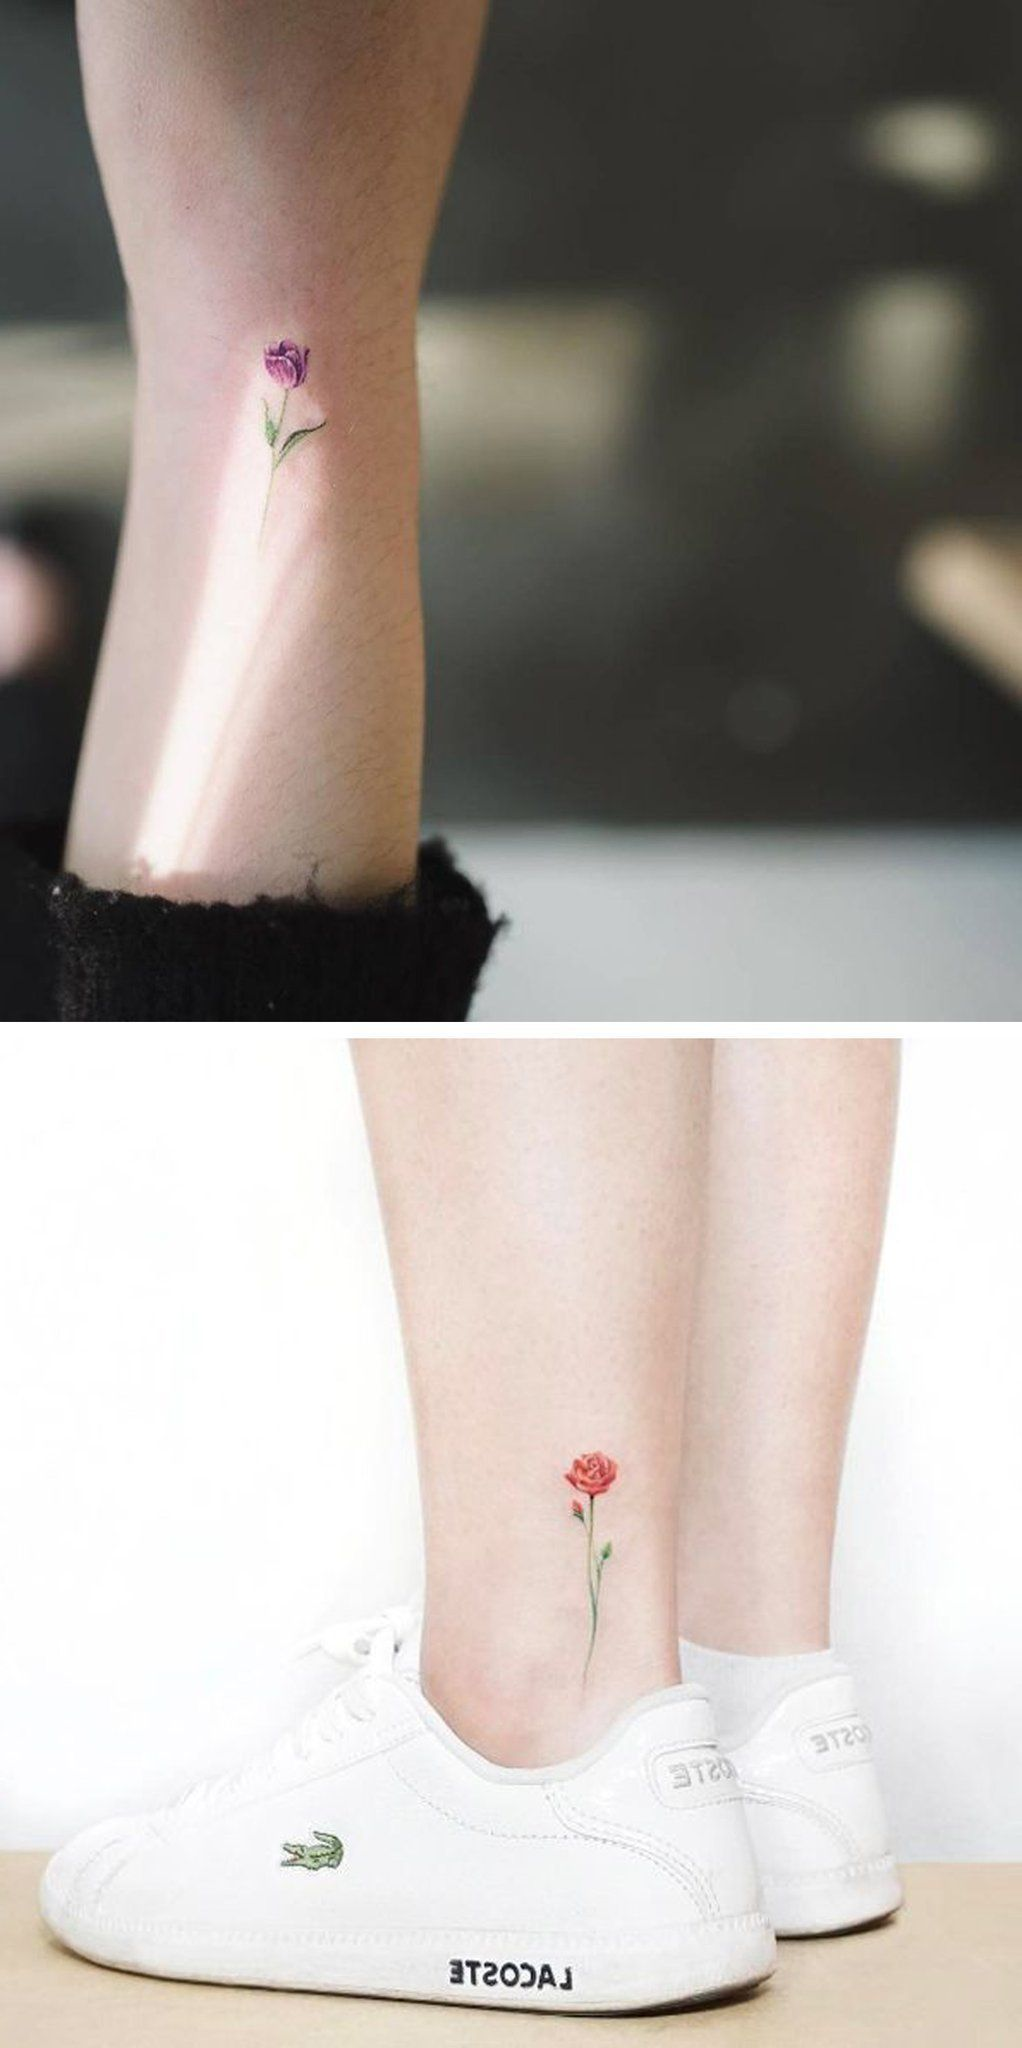 301cfa8f4 Tiny Watercolor Flower Ankle Tattoo Ideas - Colorful Rose Wrist Tatt -  MyBodiArt.com #TattooIdeasWrist